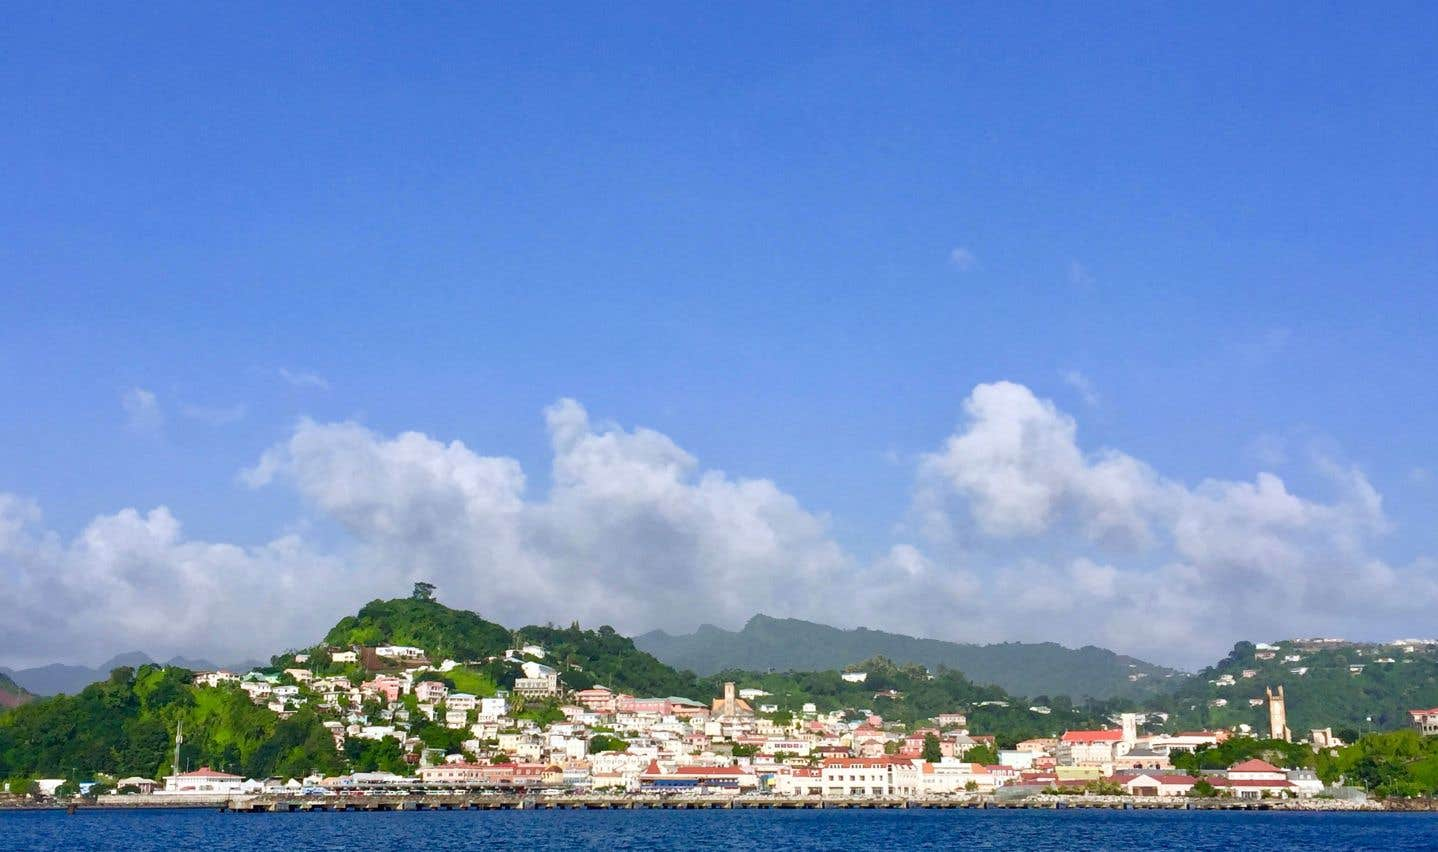 Grenade: l'île verte et son or bleu